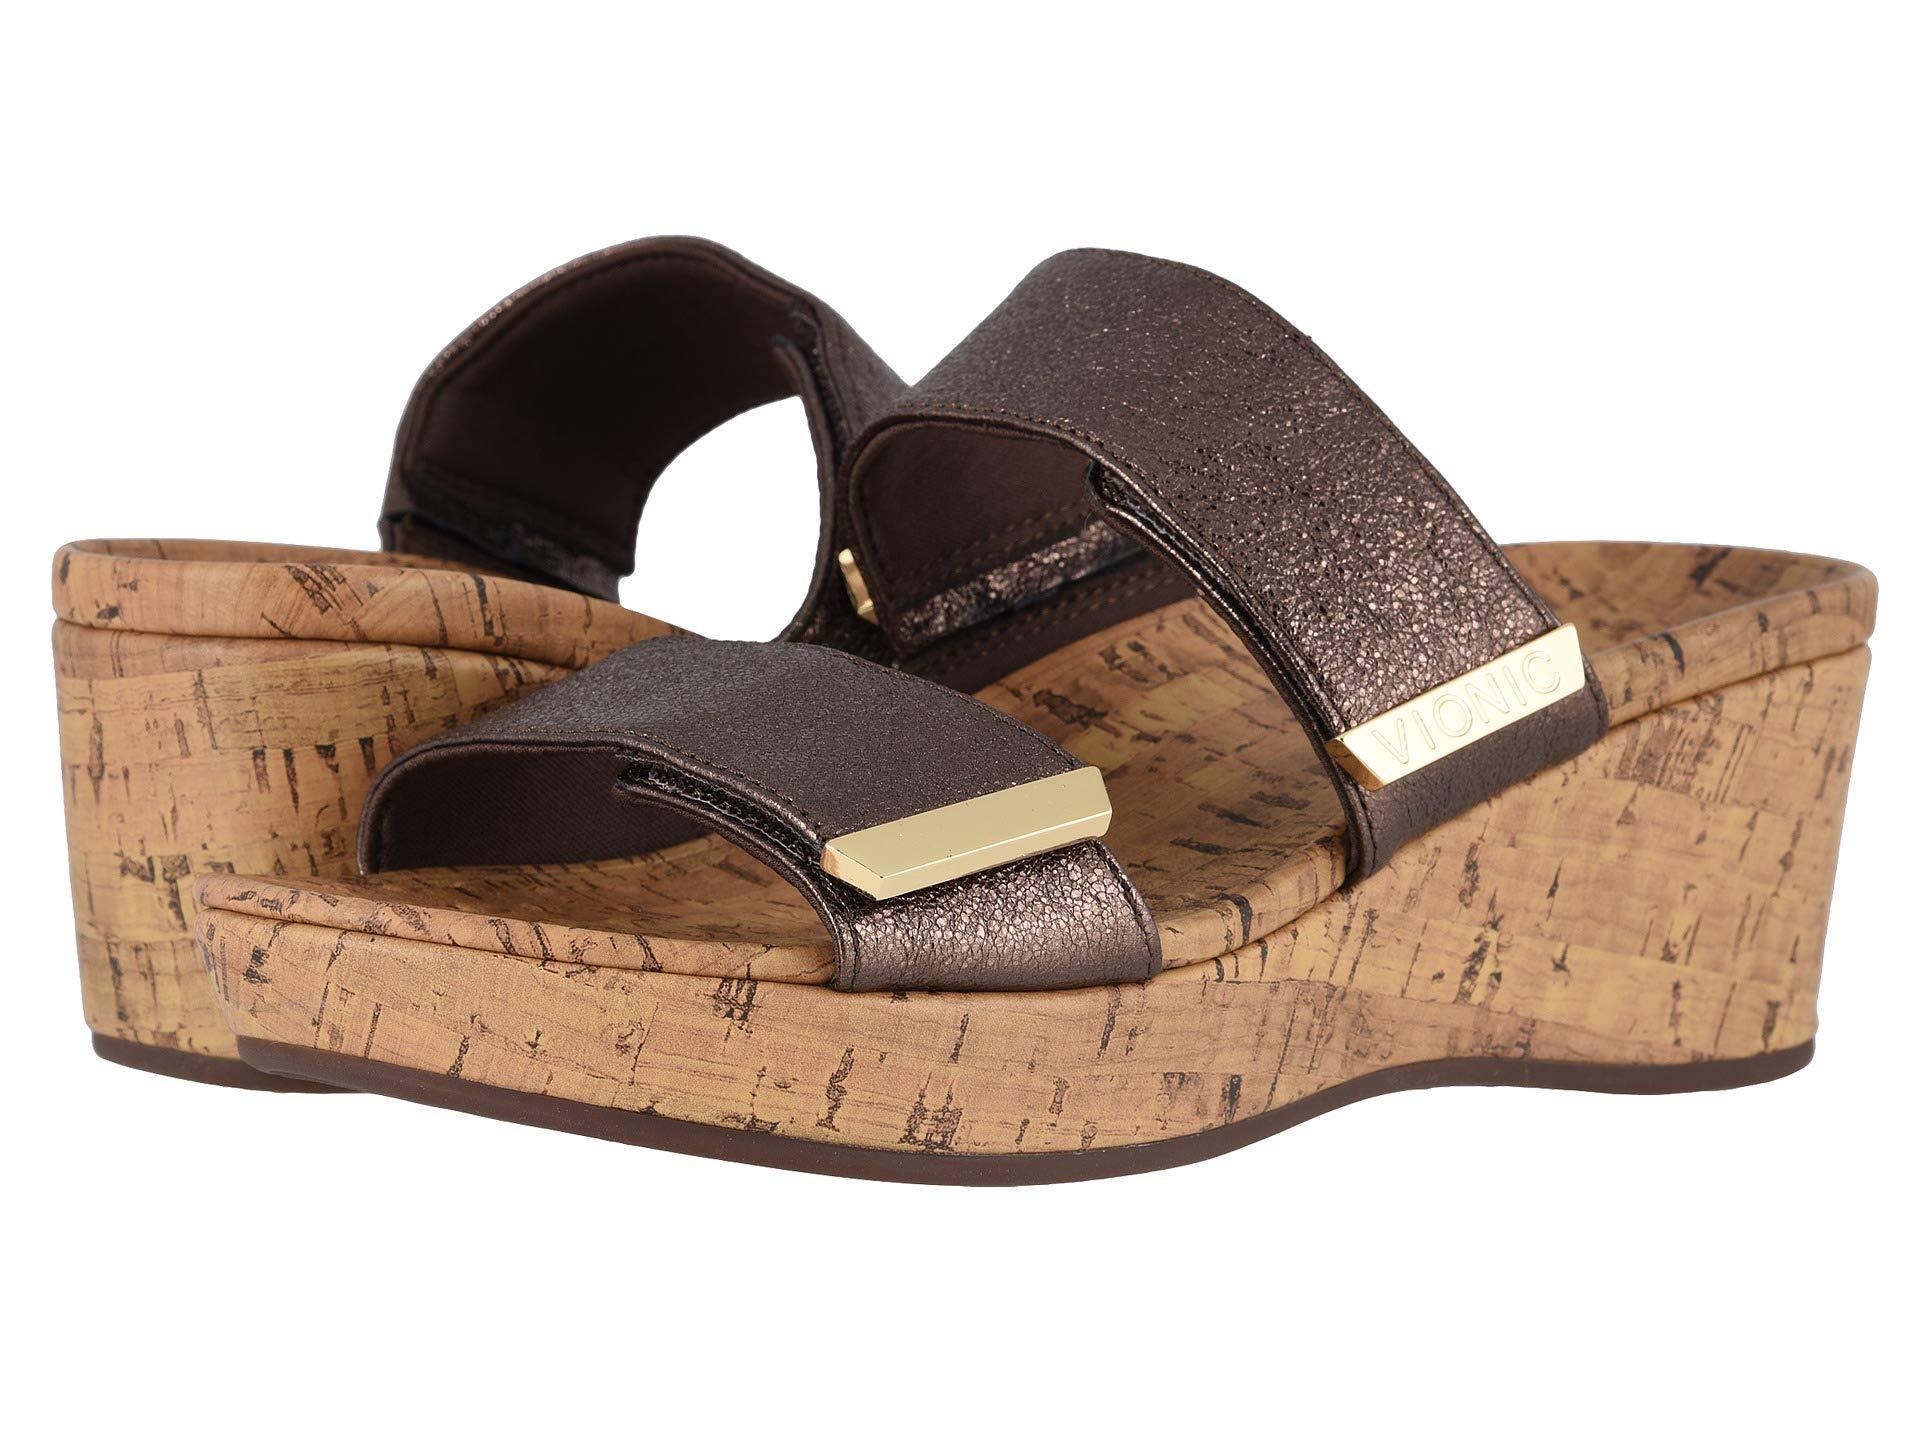 4e4cd8bd73 Lyst - Vionic Pepper Metallic (bronze) Women's Wedge Shoes in Metallic